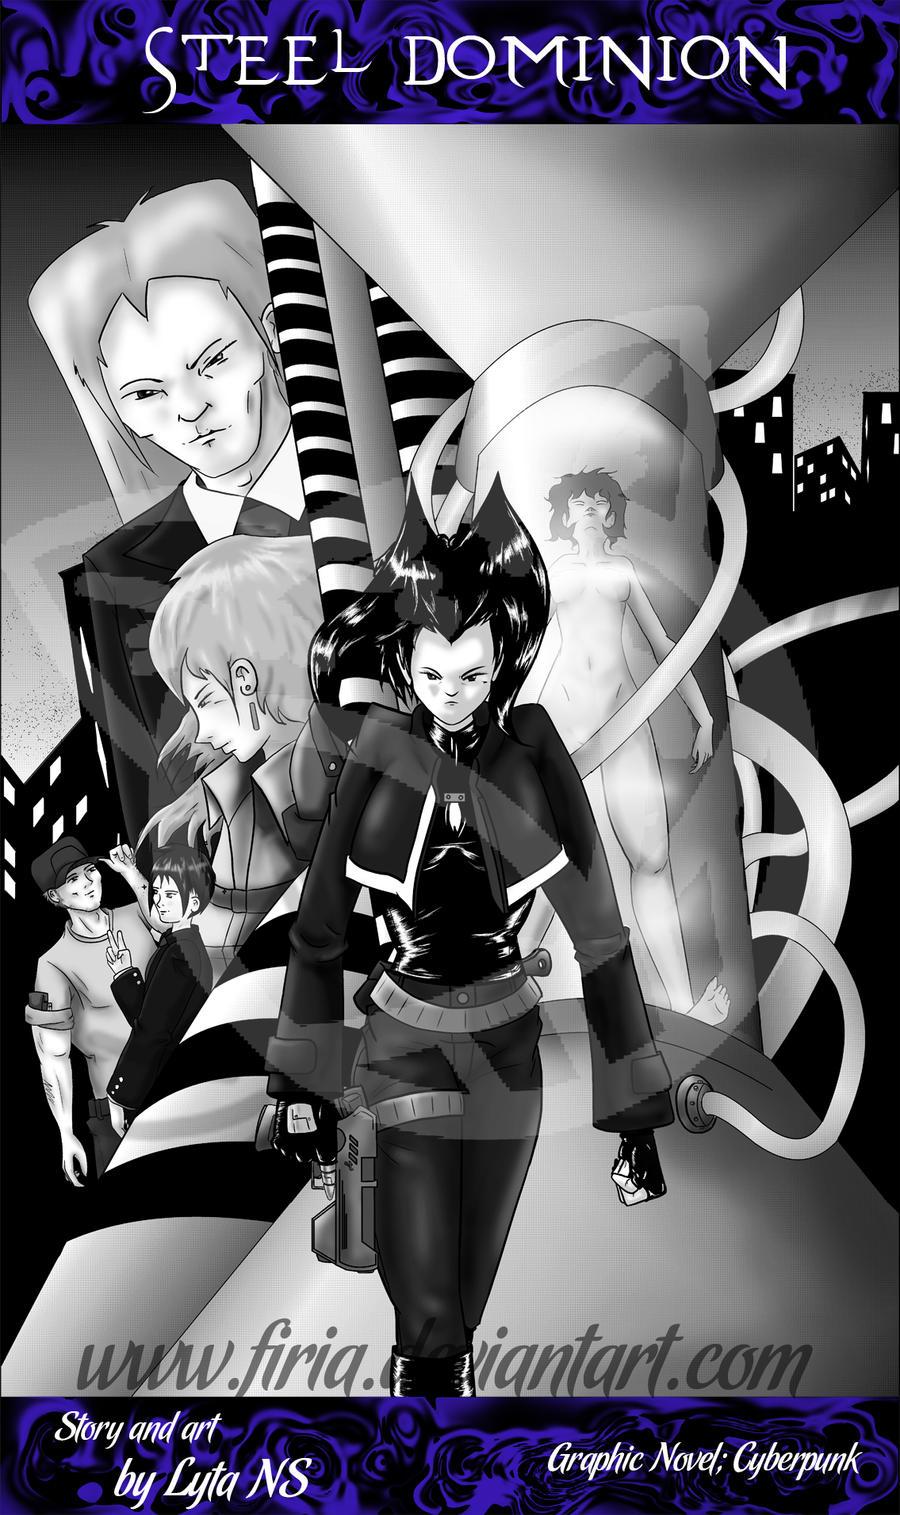 Comic Cover Print by Firia